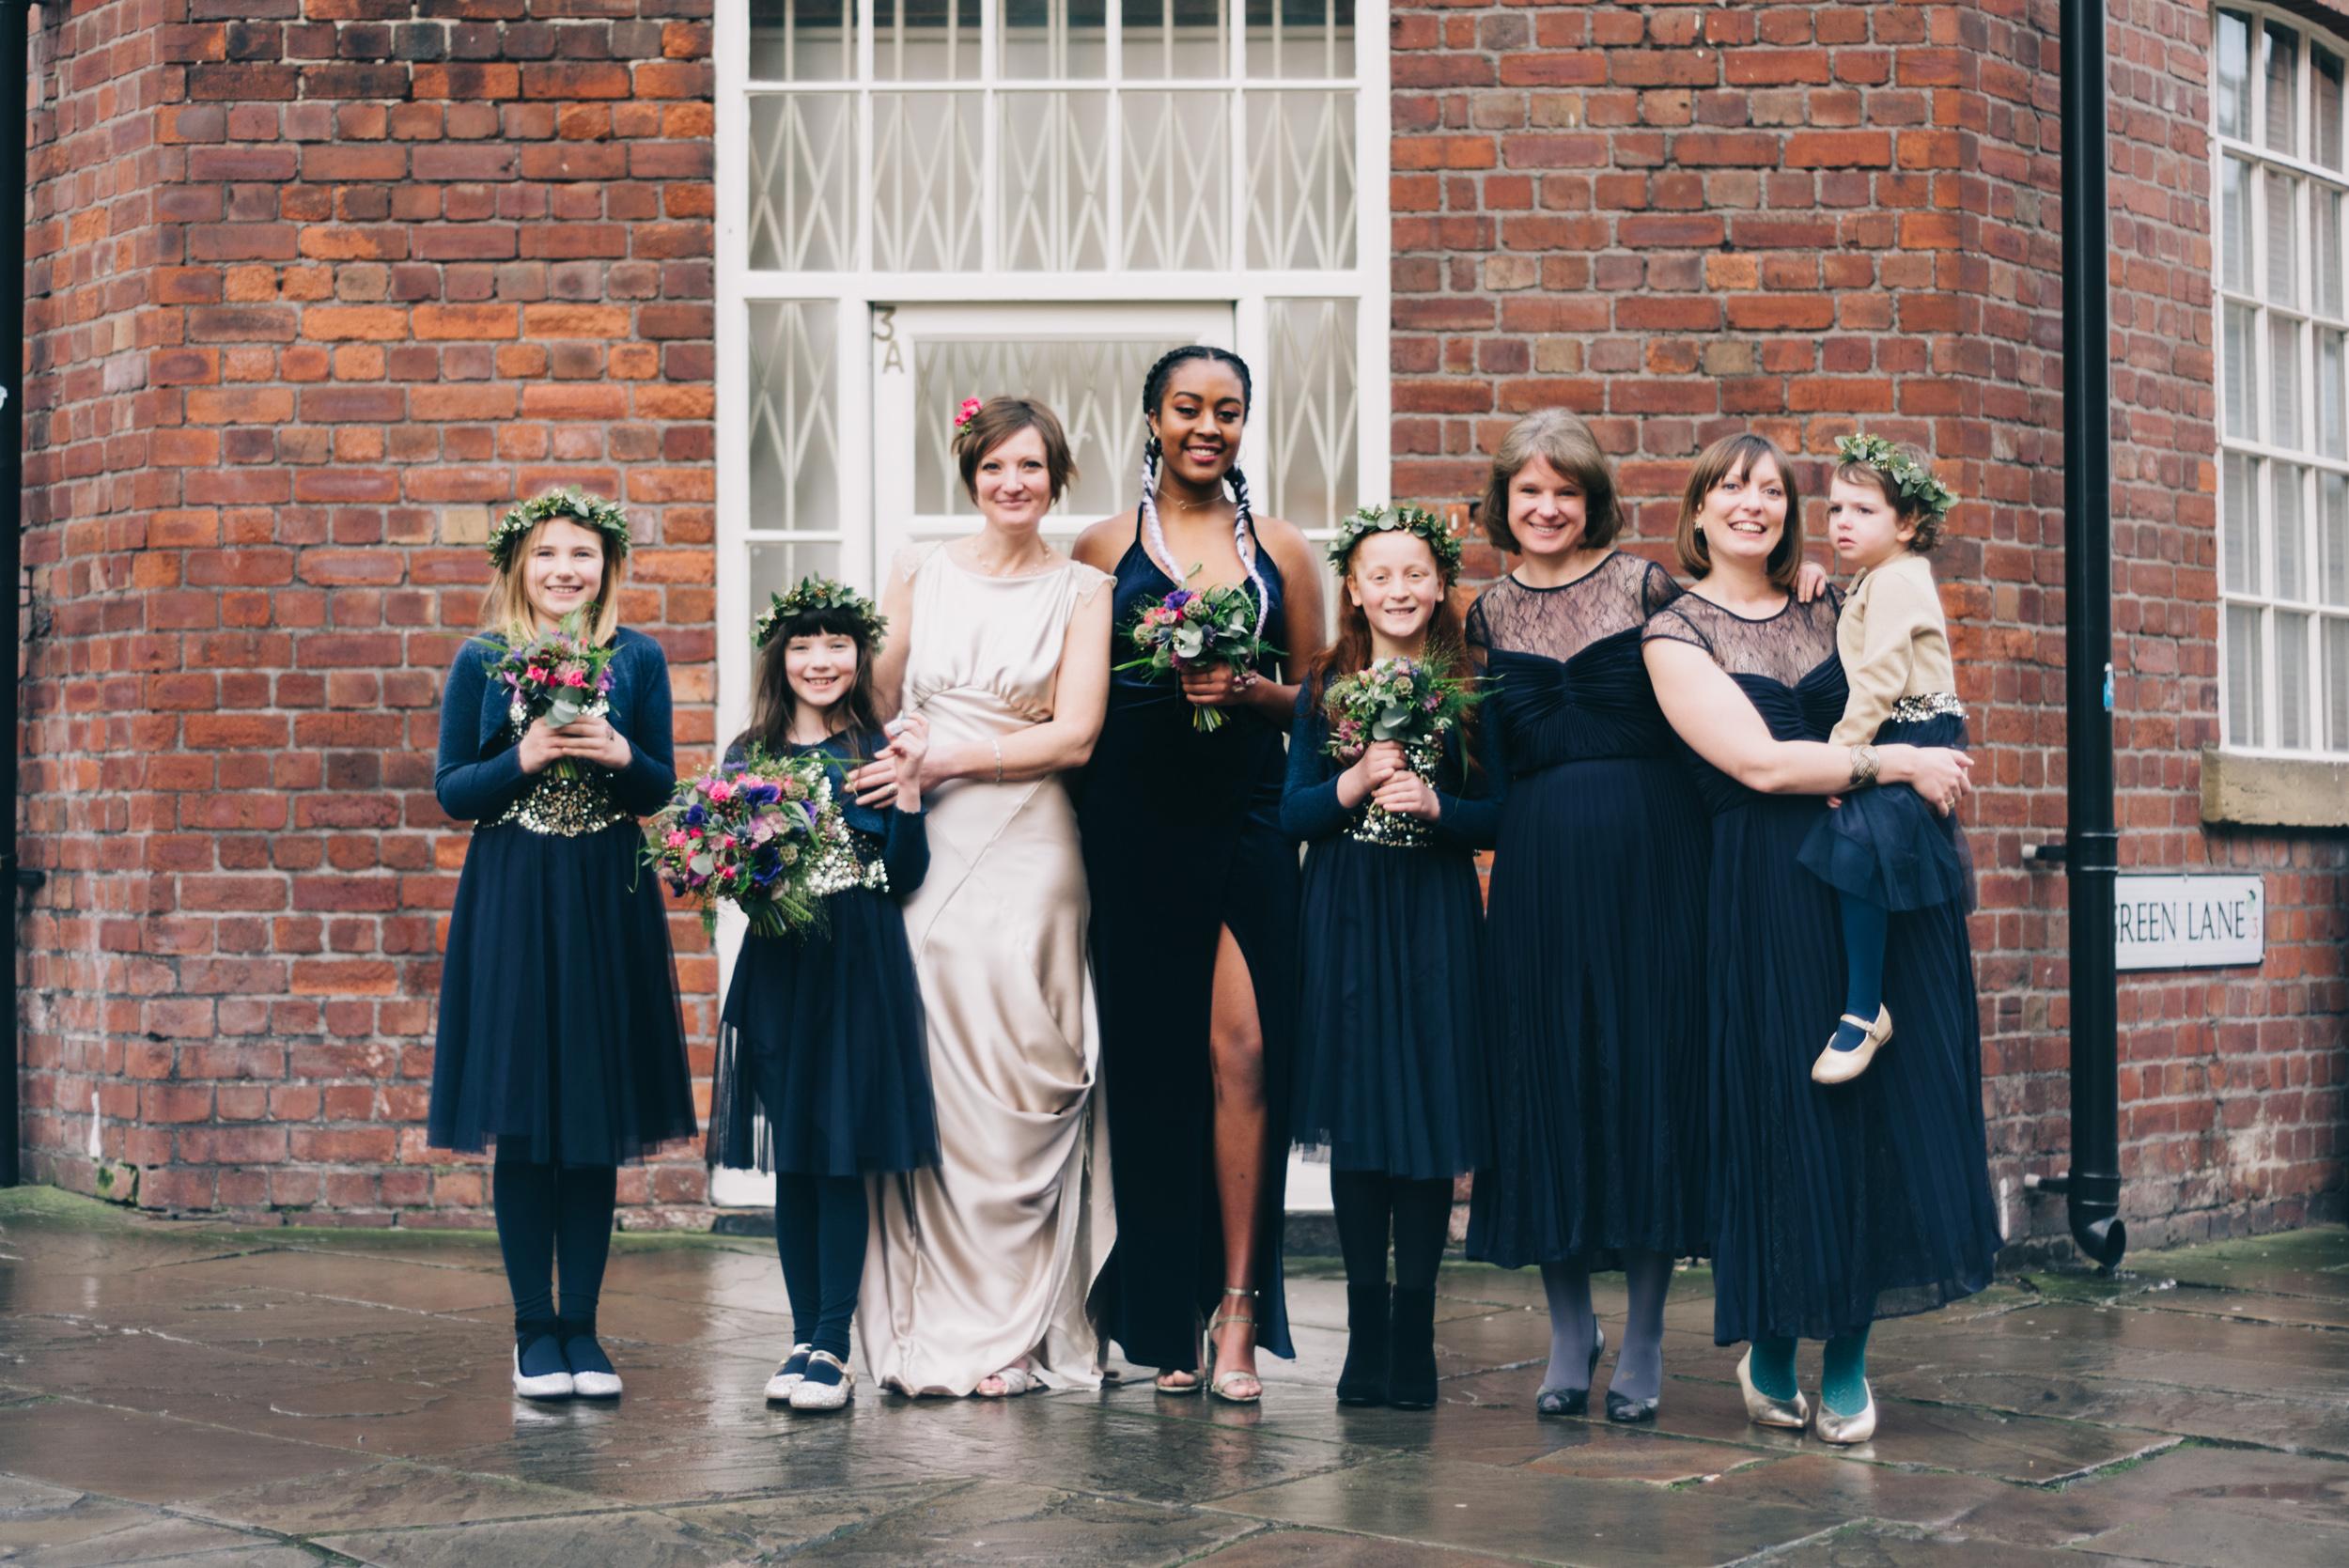 Alice-Bias-Cut-Silk-Wedding-Dress-Kate-Beaumont-Sheffield-Botanical-Gardens-by-Peakography-22.jpg